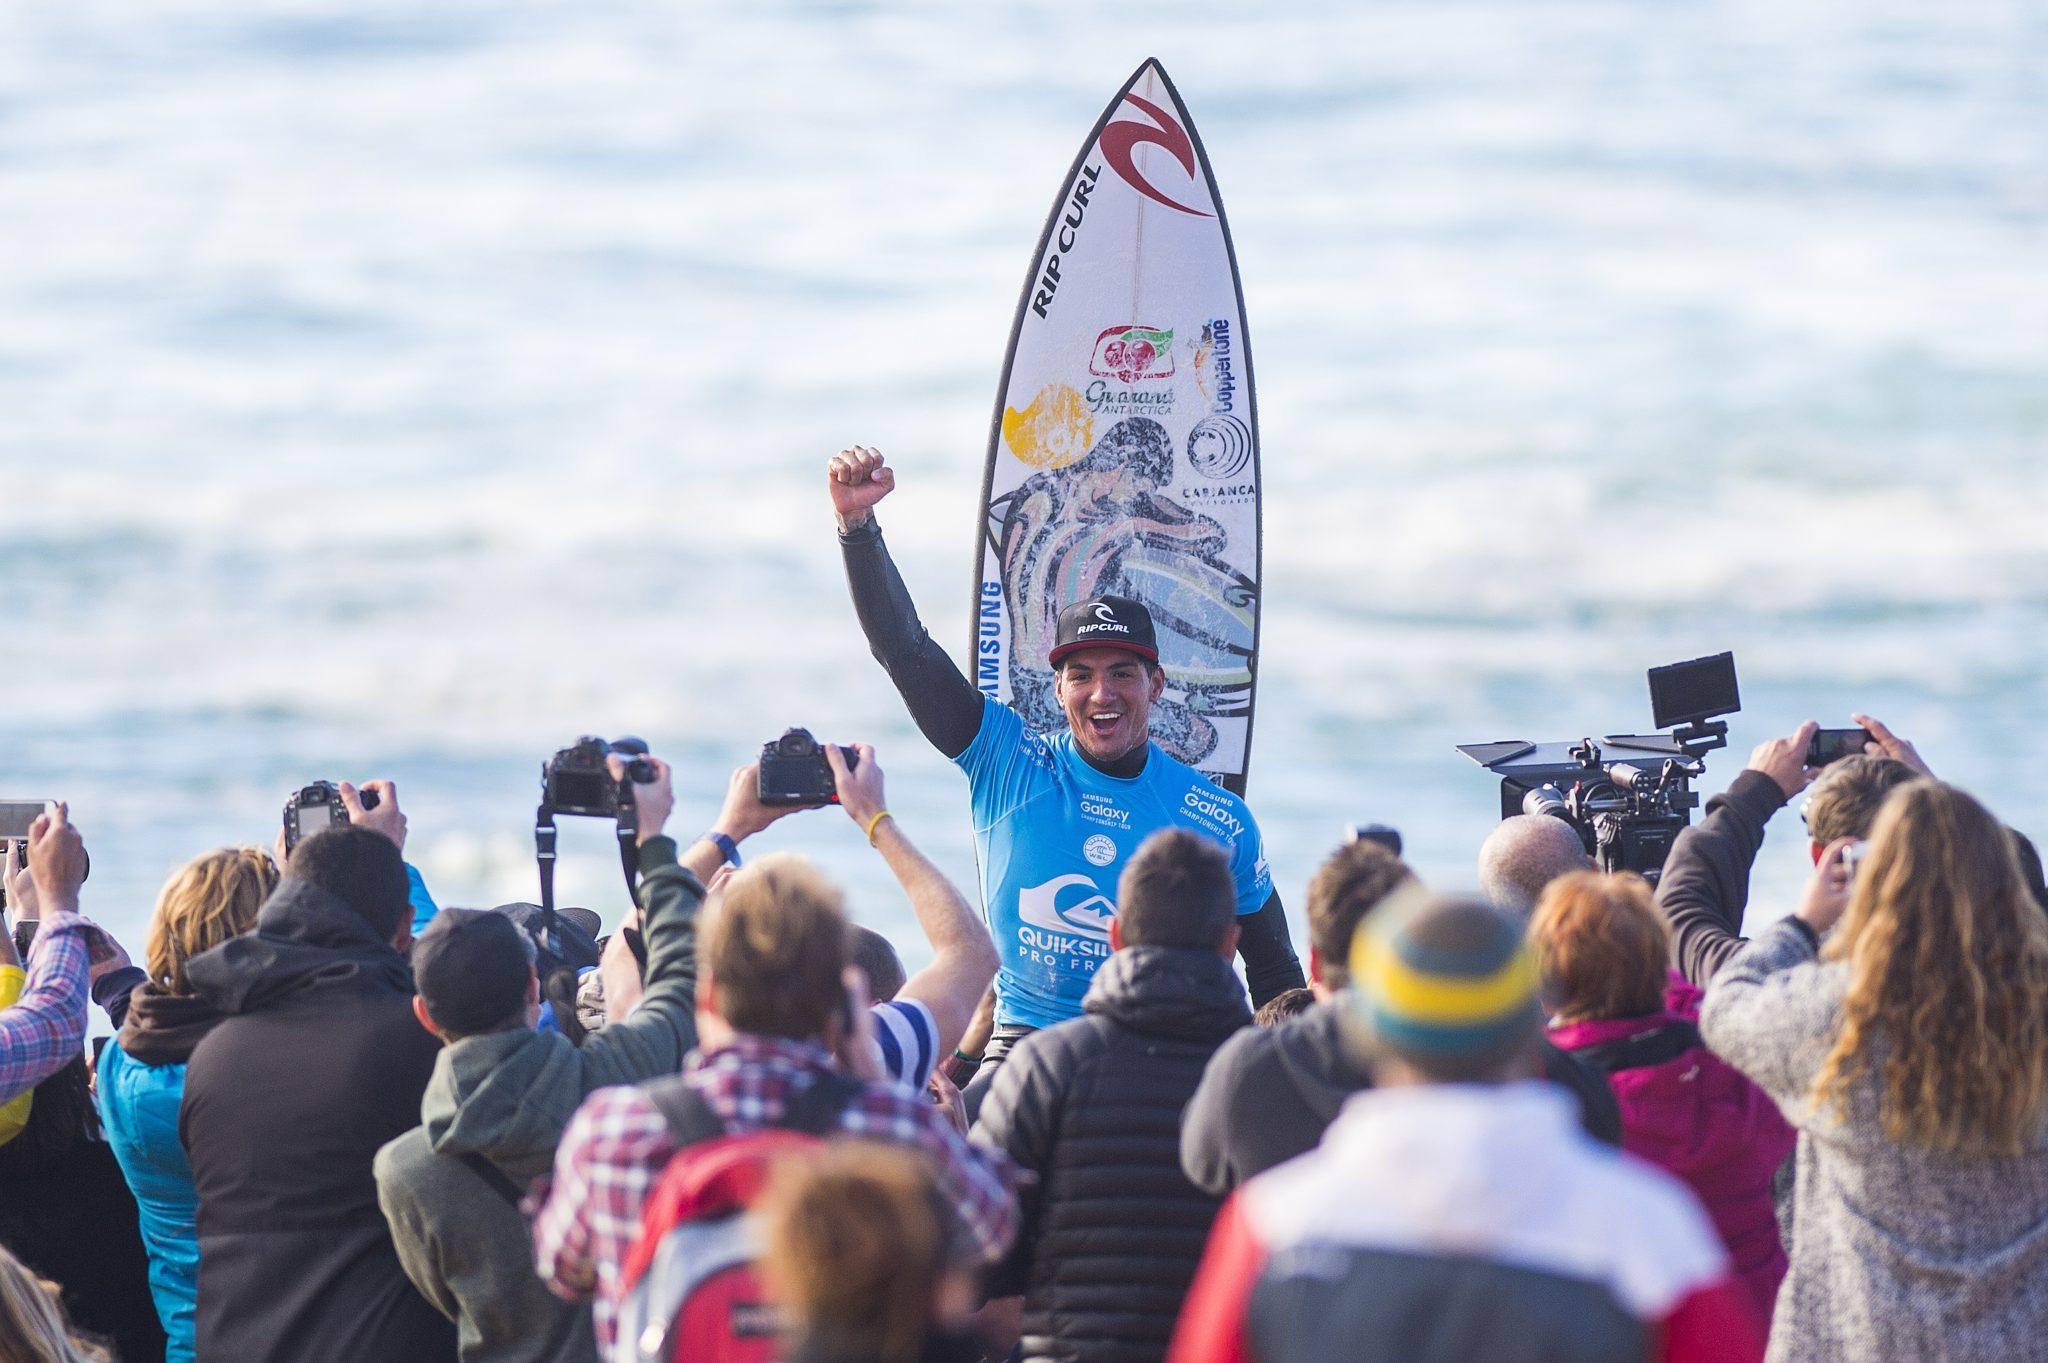 Medina comemora o bicampeonato na França em 2015 / Foto Kirstin